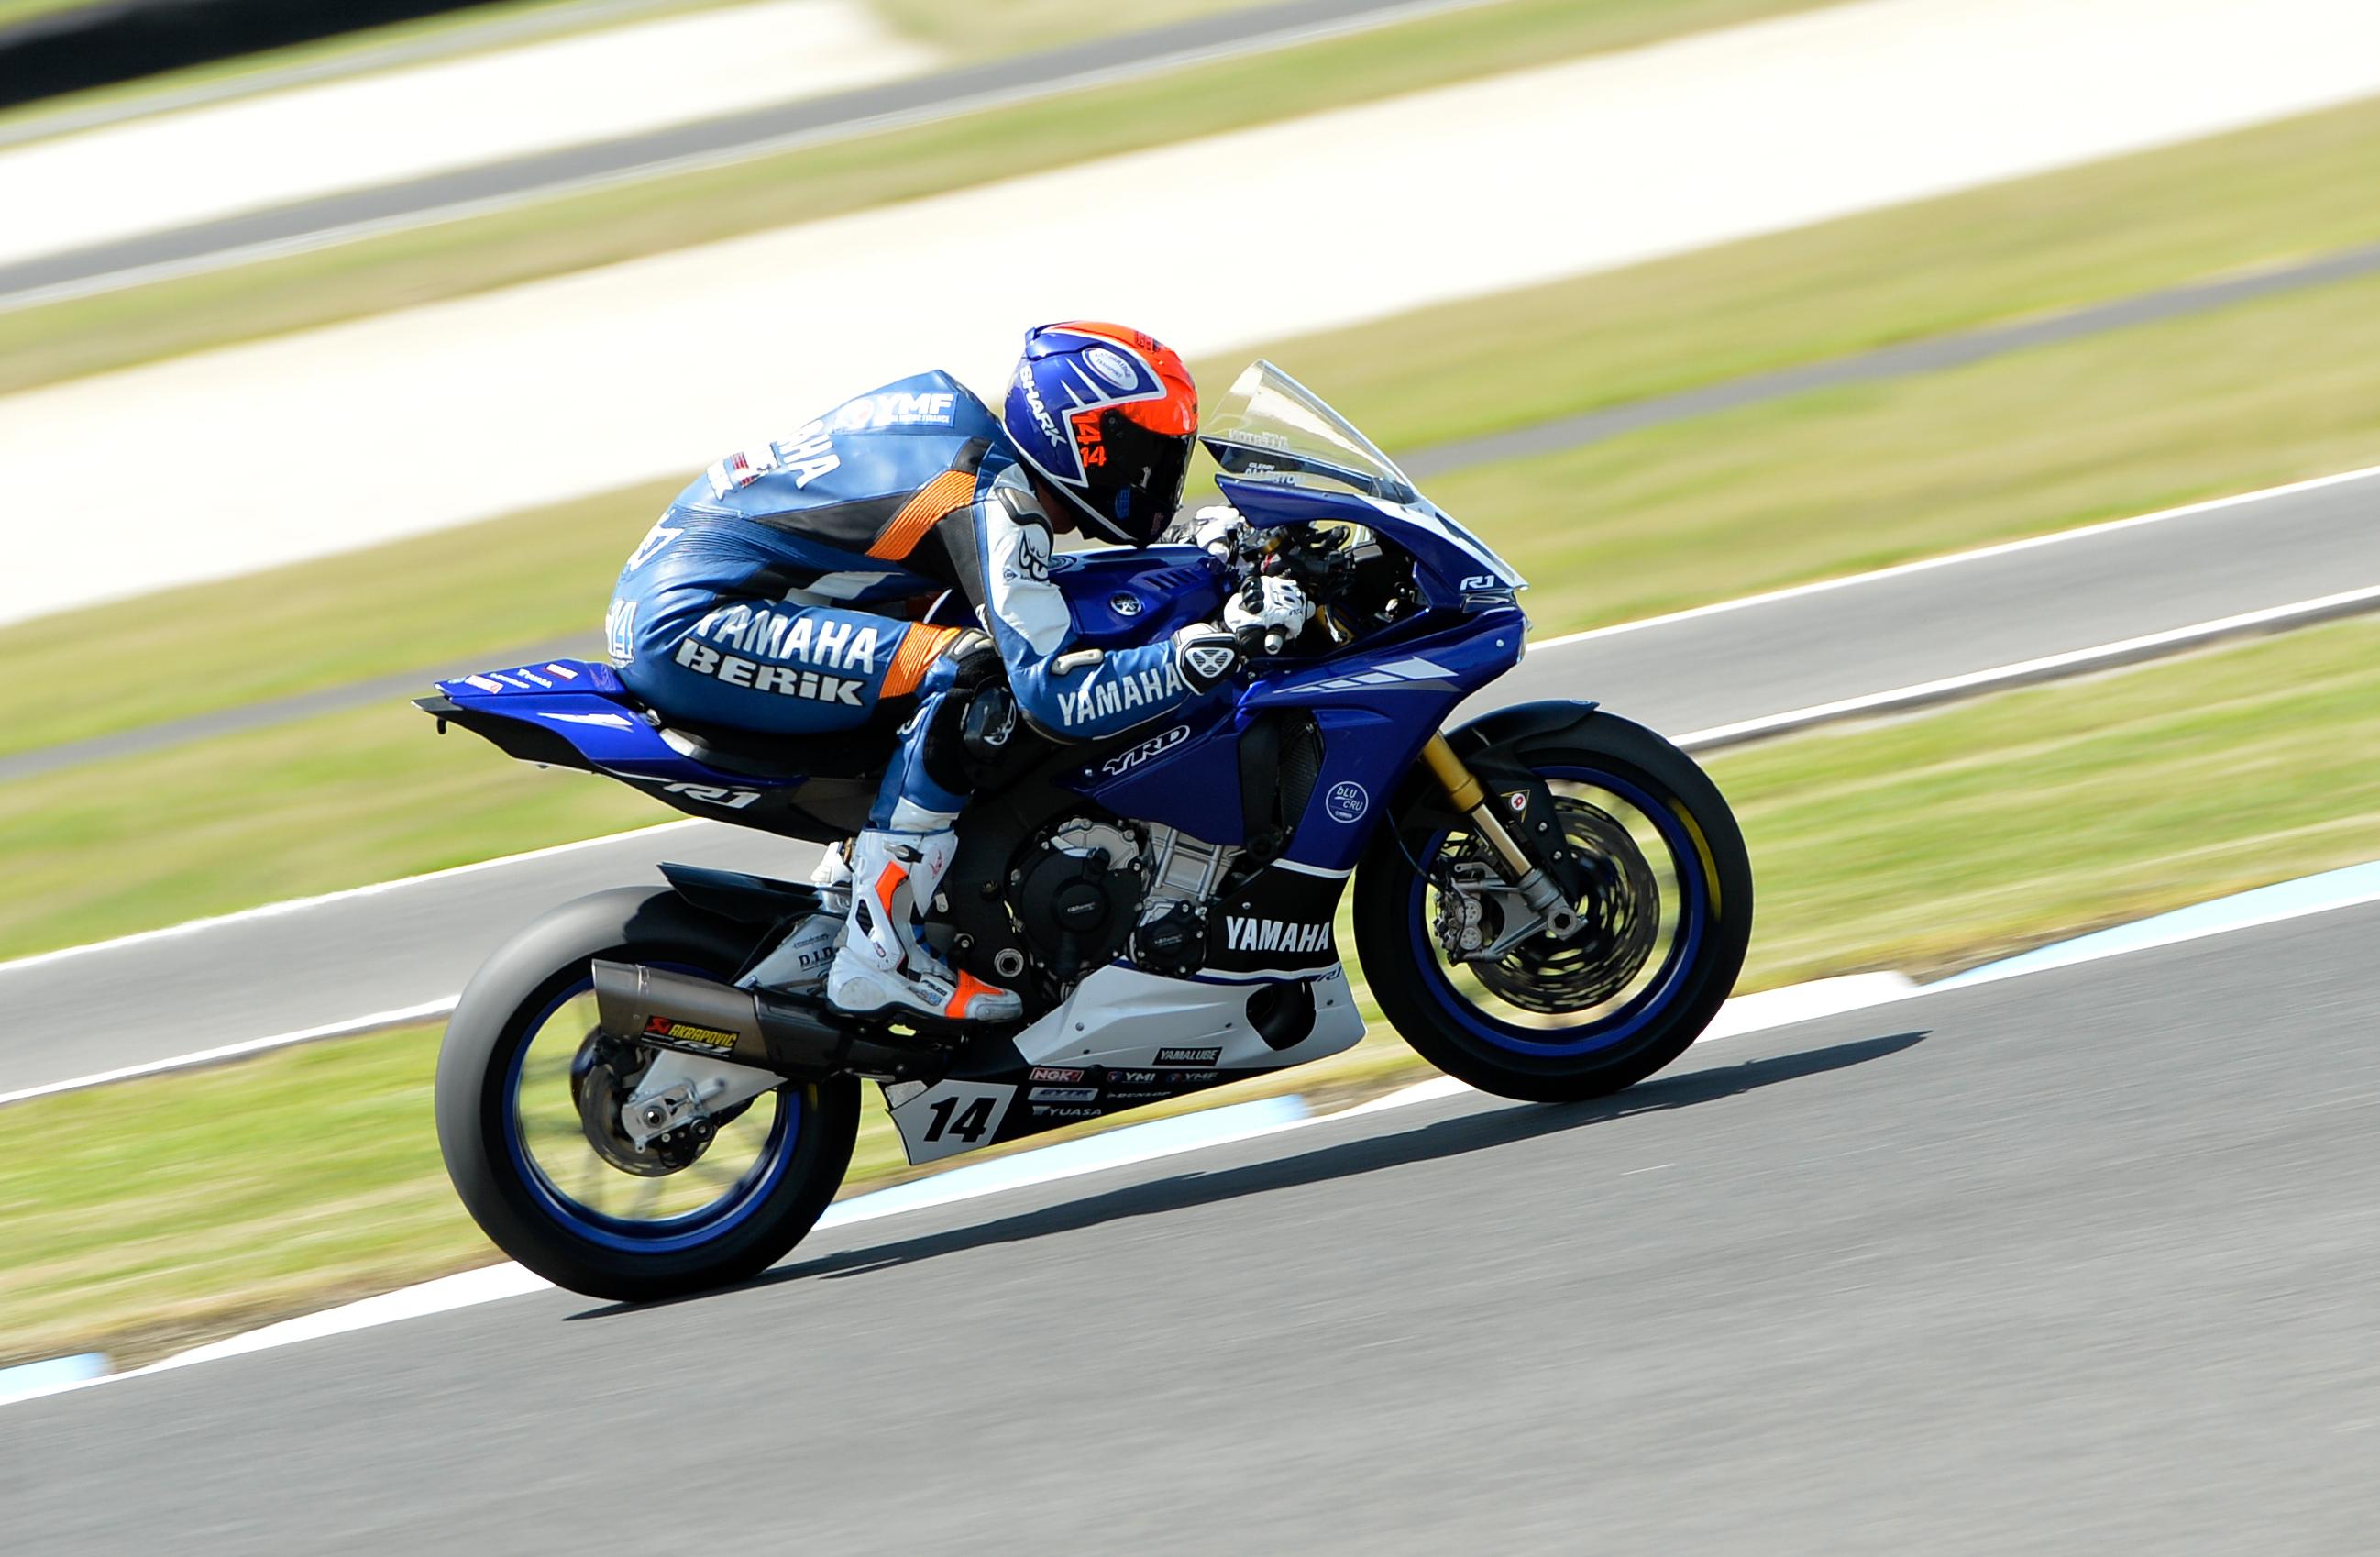 2017 Australian Superbike Championship (ASBK) - Phillip Island